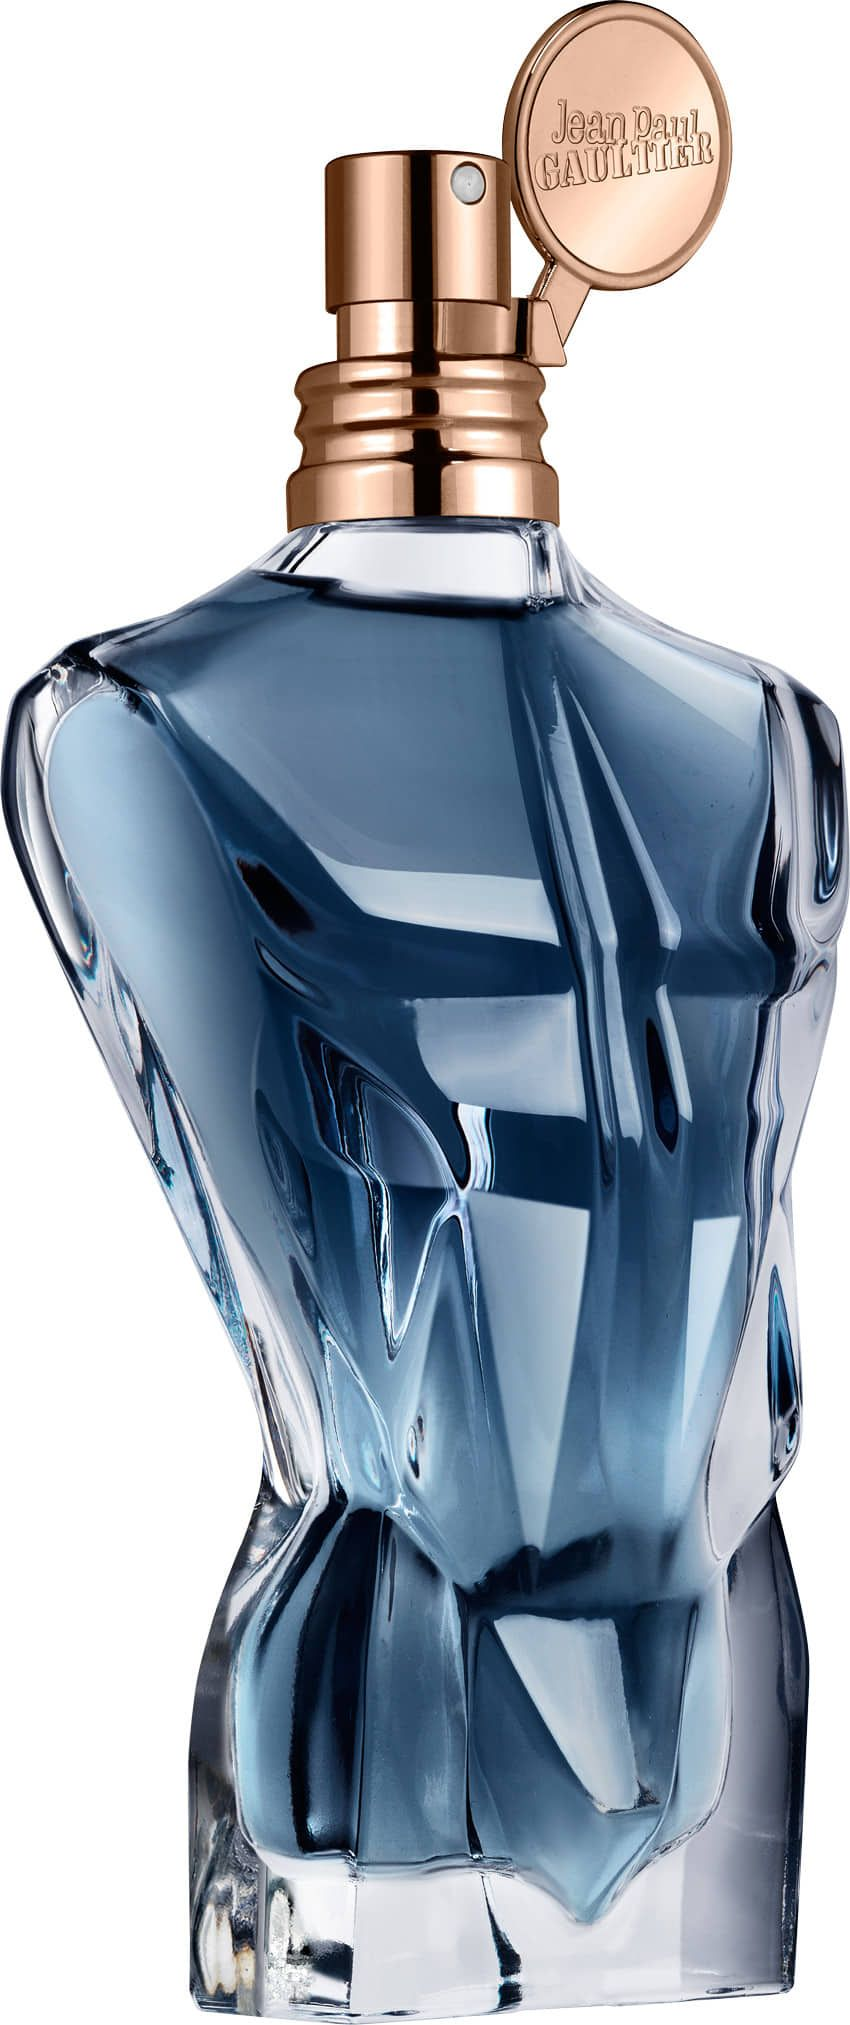 De Jean Parfum Yf76vbgy Male Essence Le Eau Paul Gaultier Intense n0m8vwN